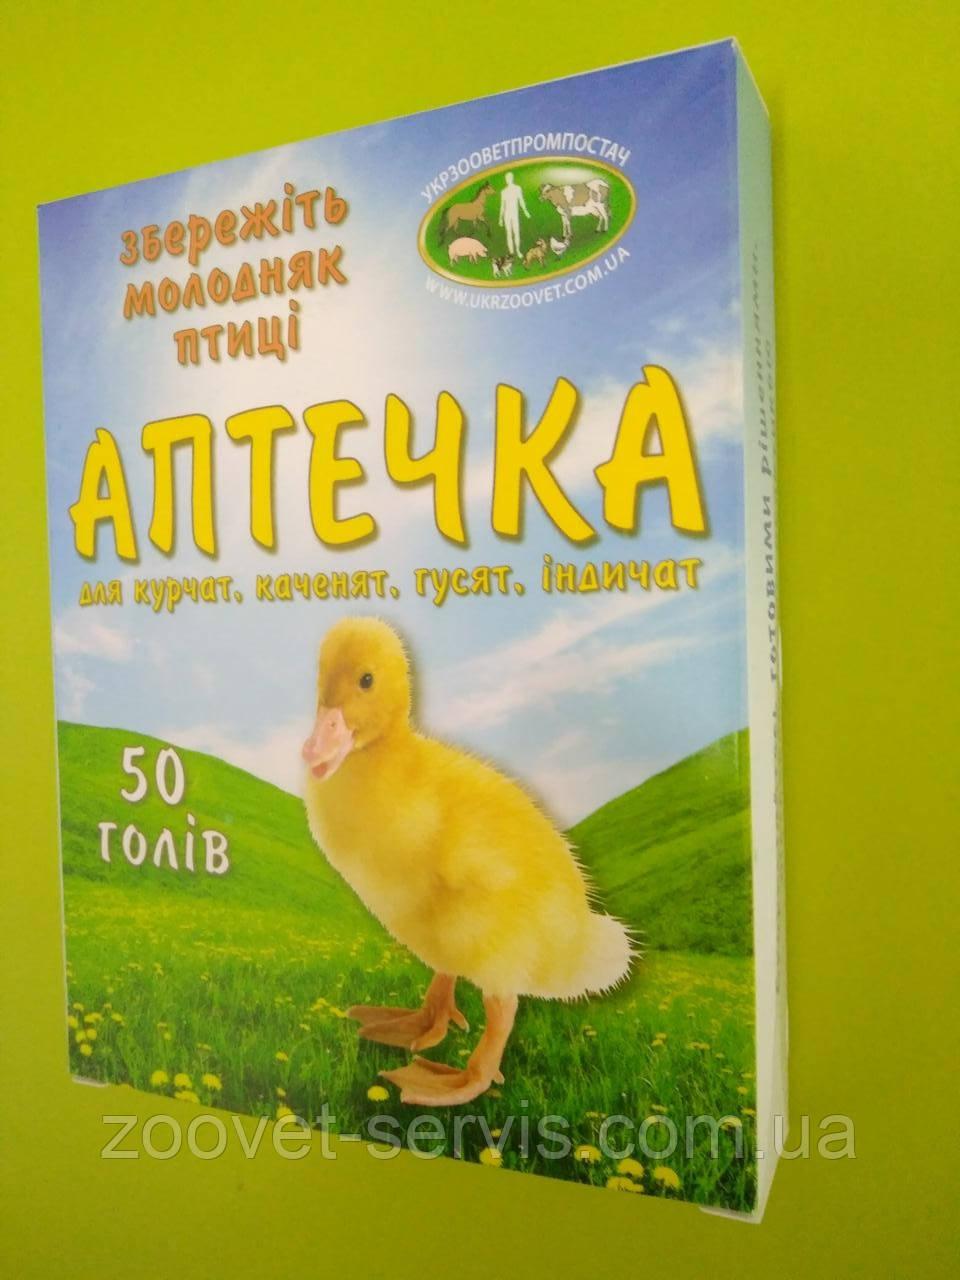 Ветеринарнa аптечкa №3 дляиндюшат, цыплят, утят игусят